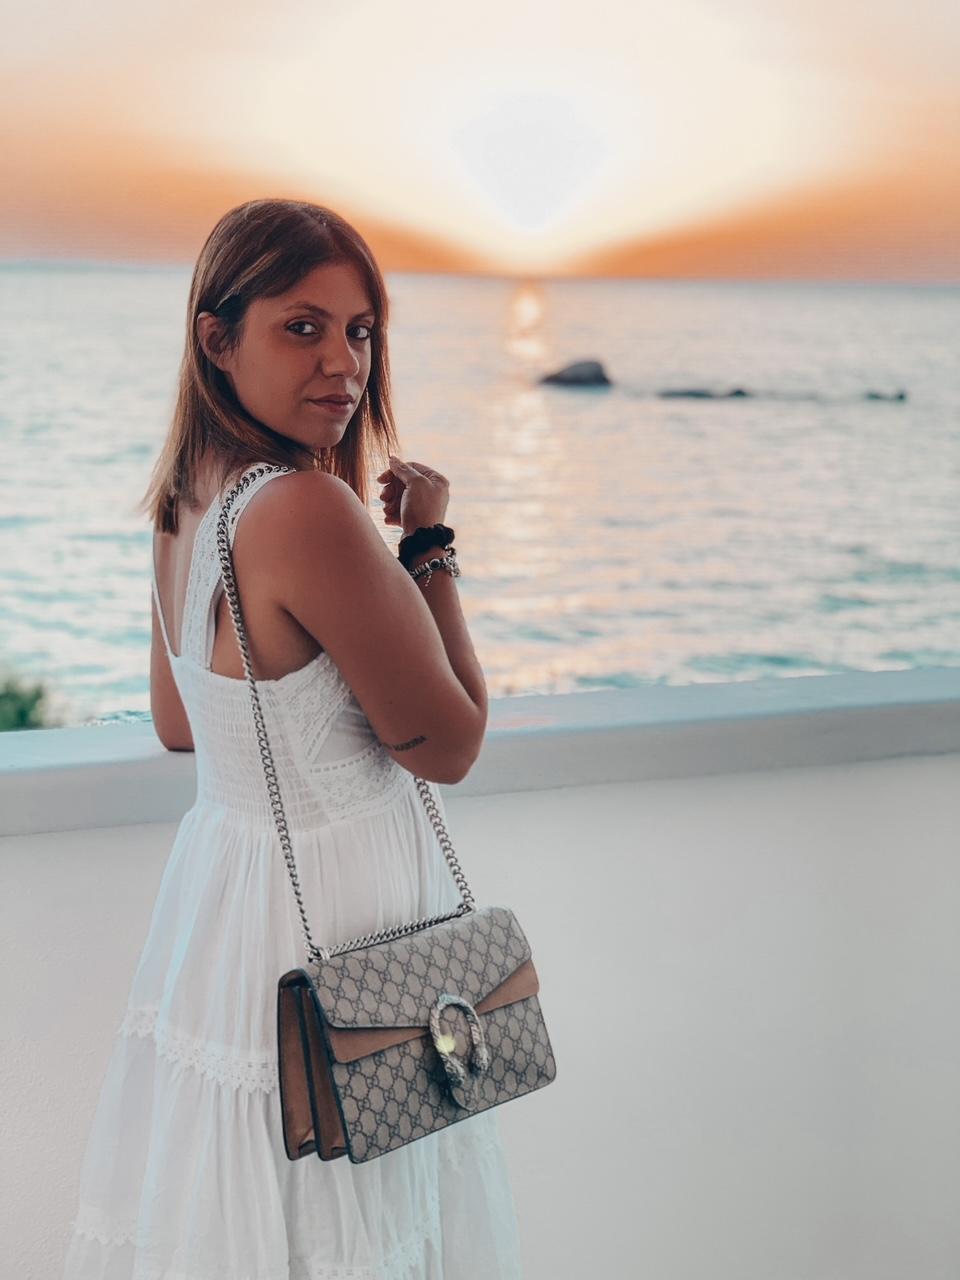 Laura Colagrossi - Influencer - Direzione Hotel